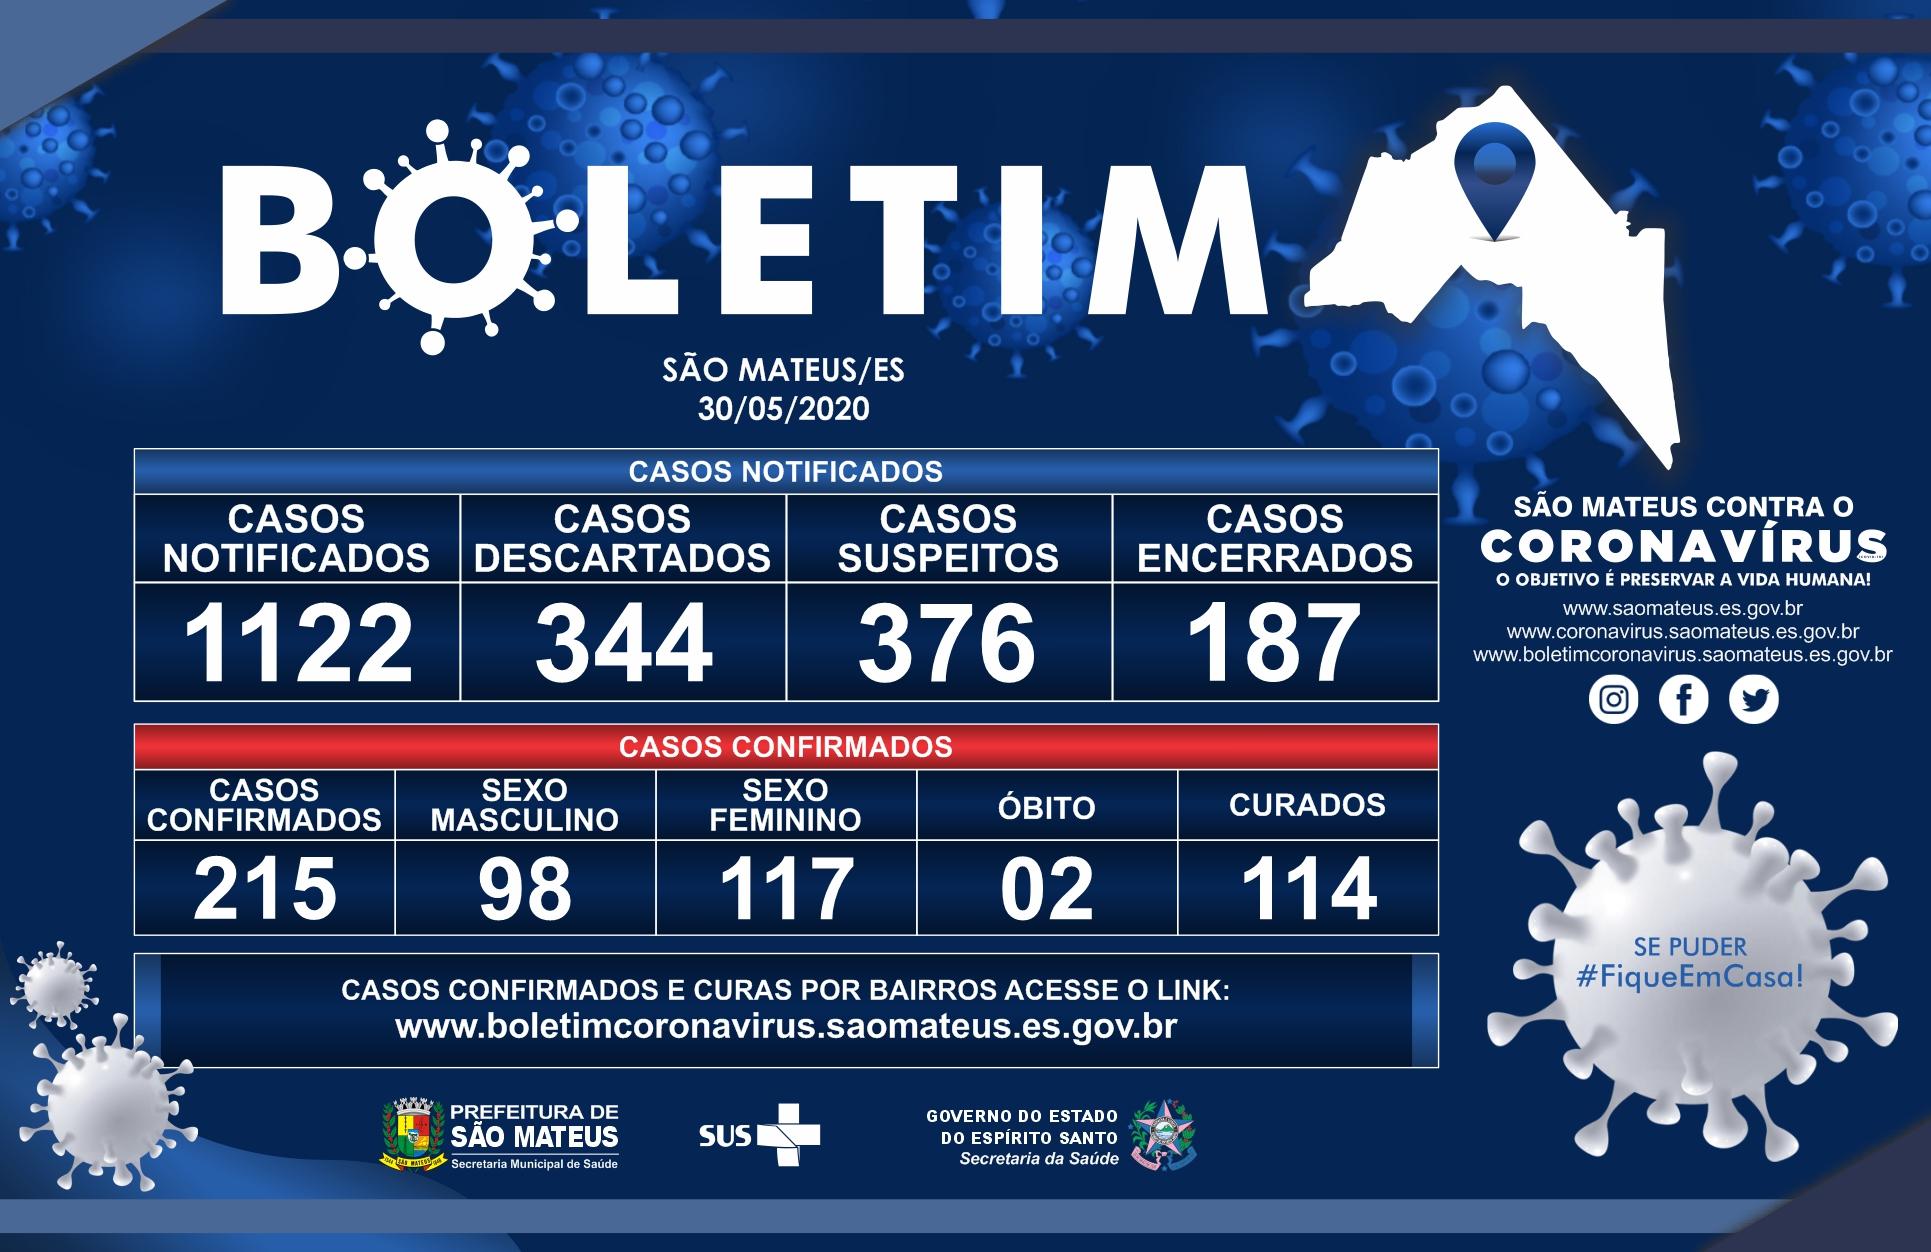 SÁBADO, 30 DE MAIO DE 2020: CONFIRA O BOLETIM DO CORONAVÍRUS